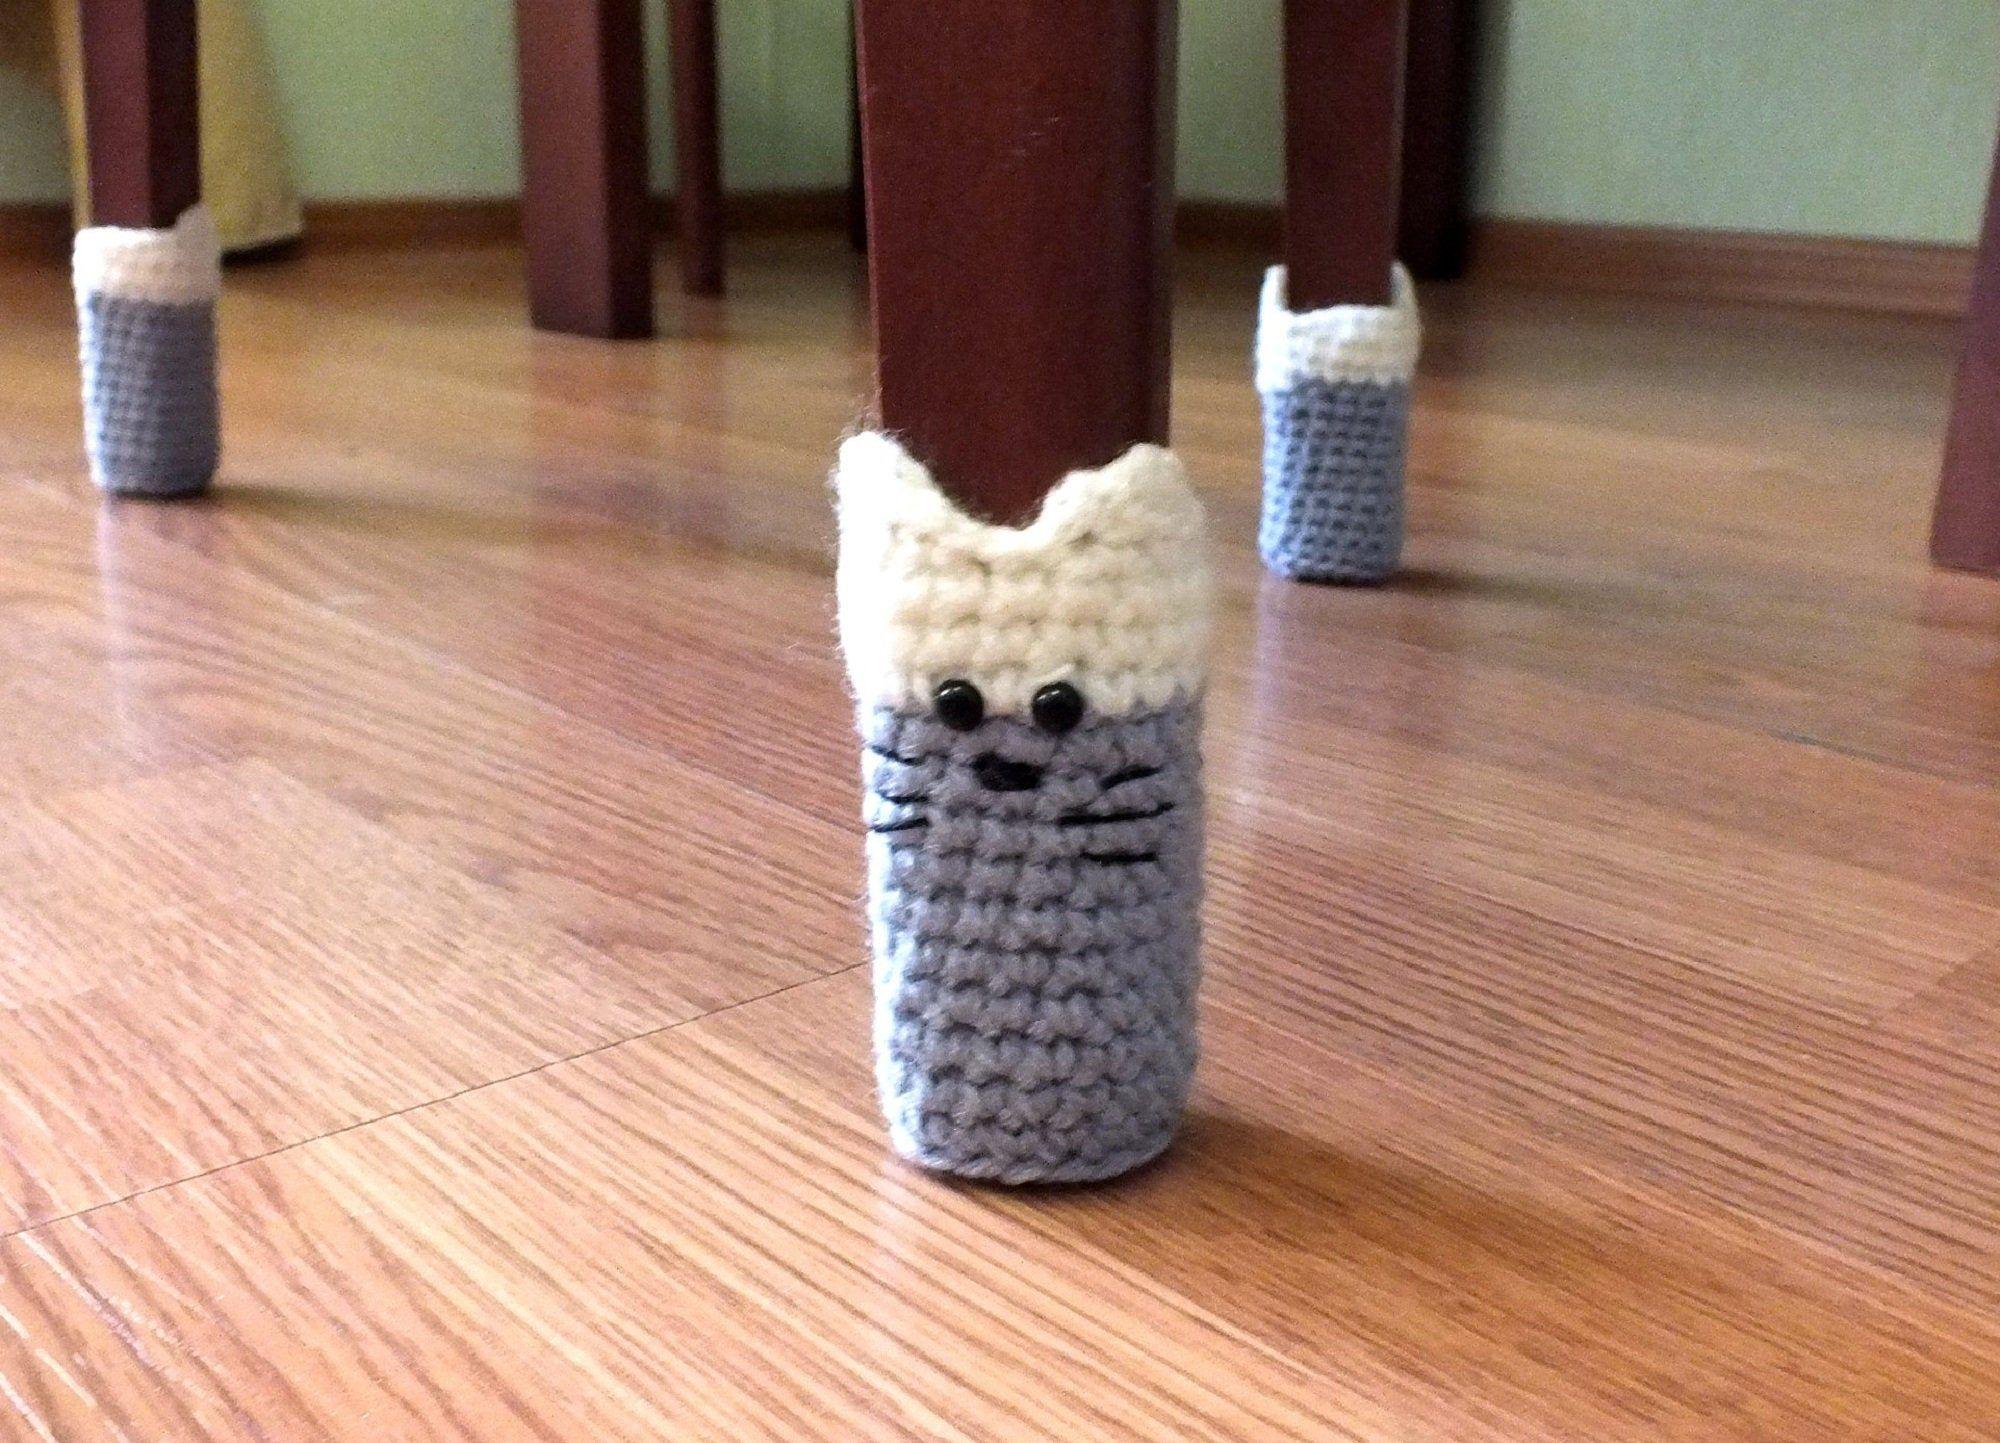 Chair Socks Cat Paw Sock Chair Socks For Chair Legs As Chair Etsy In 2020 Chair Socks Crochet Toilet Roll Cover Chair Socks Crochet